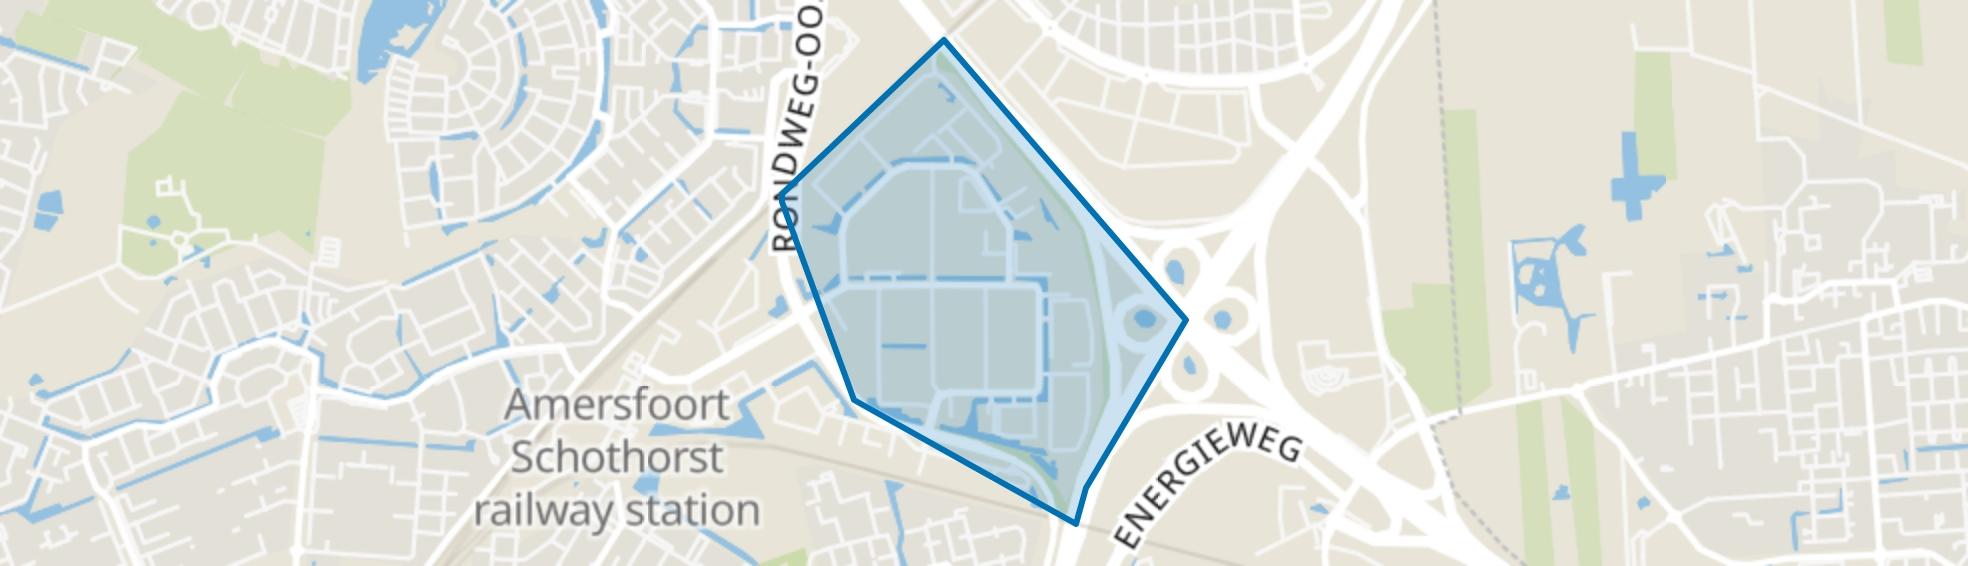 De Hoef-Oost, Amersfoort map